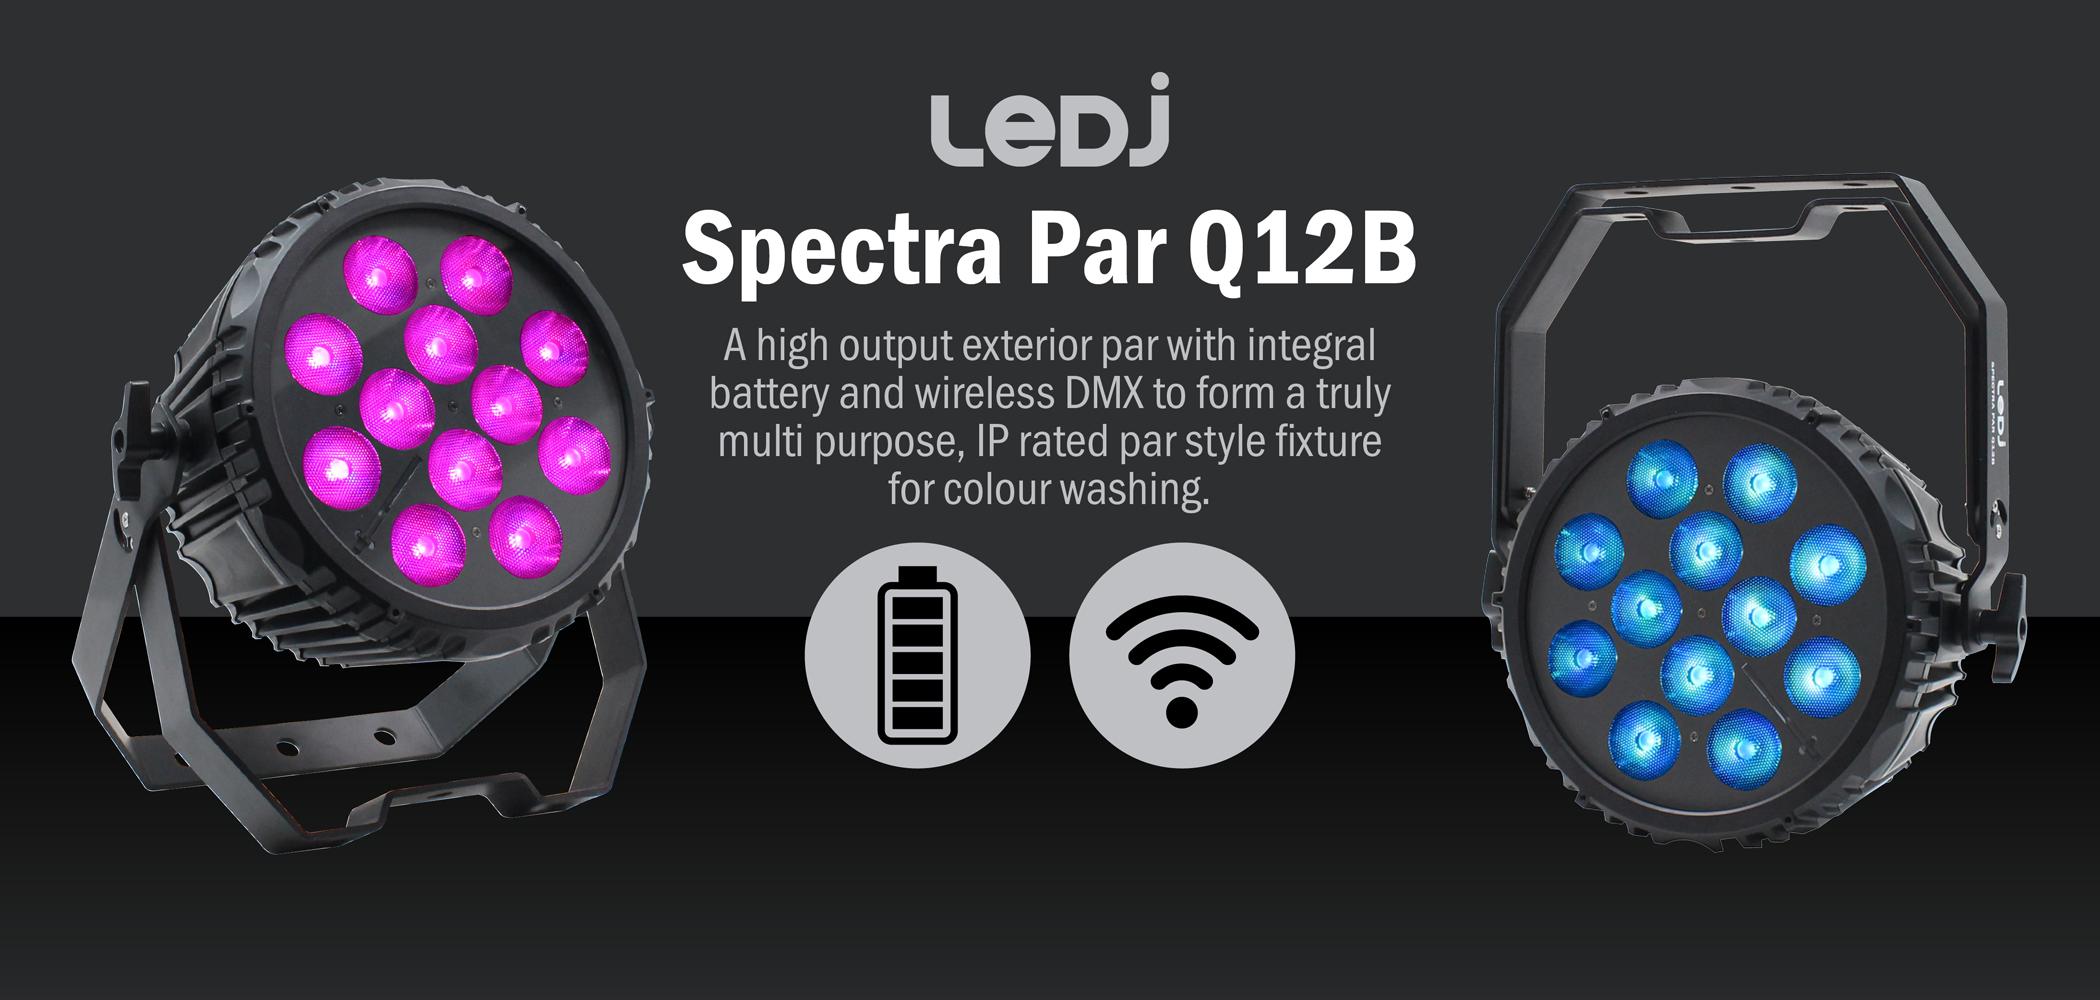 LEDJ Spectra Par Q12B Exterior Fixture